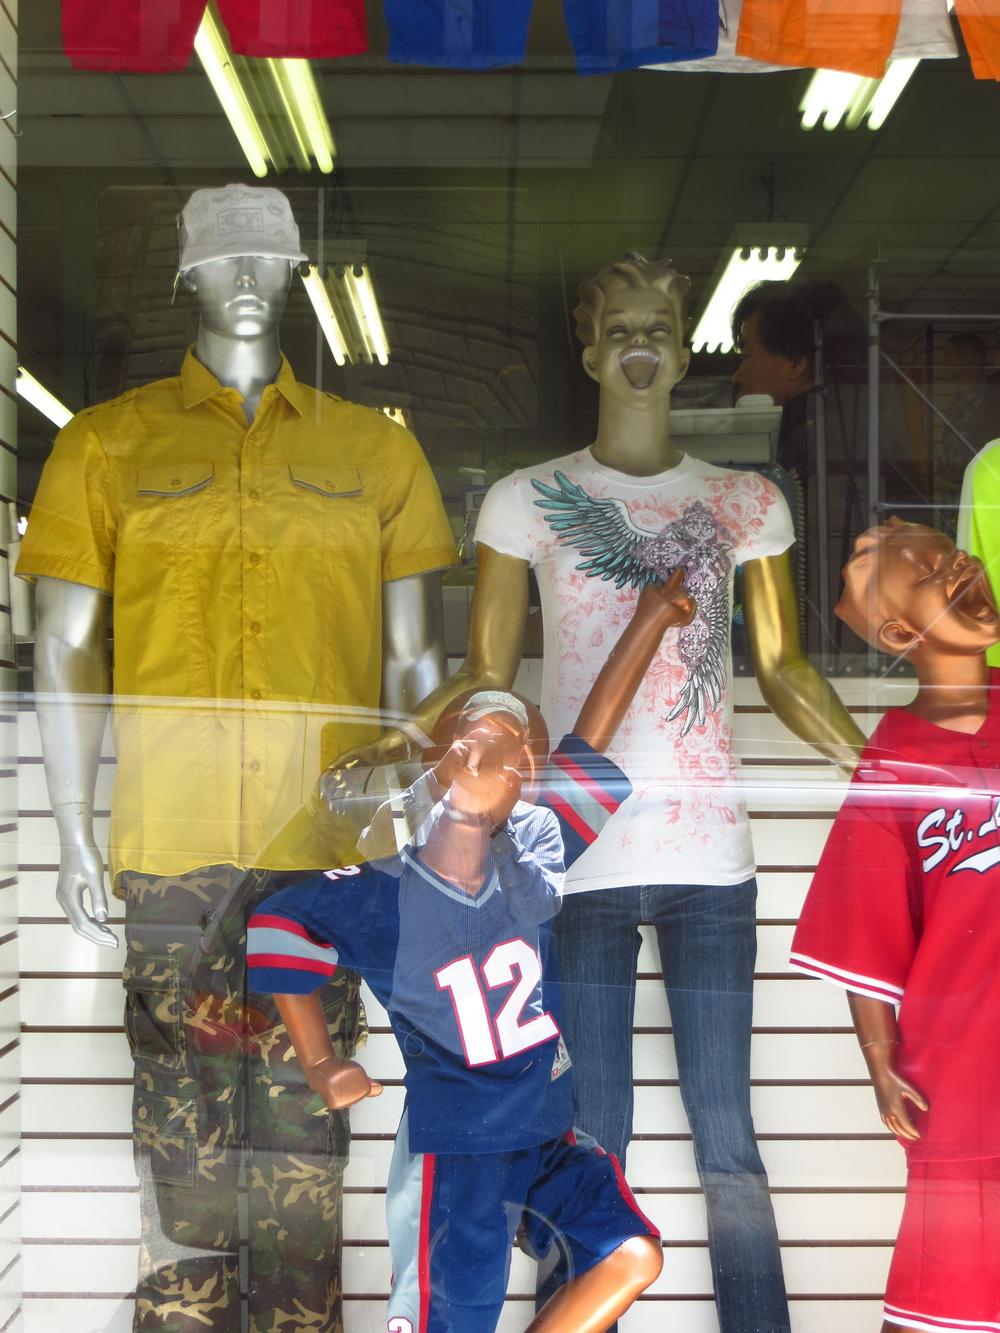 Terrifying mannequins